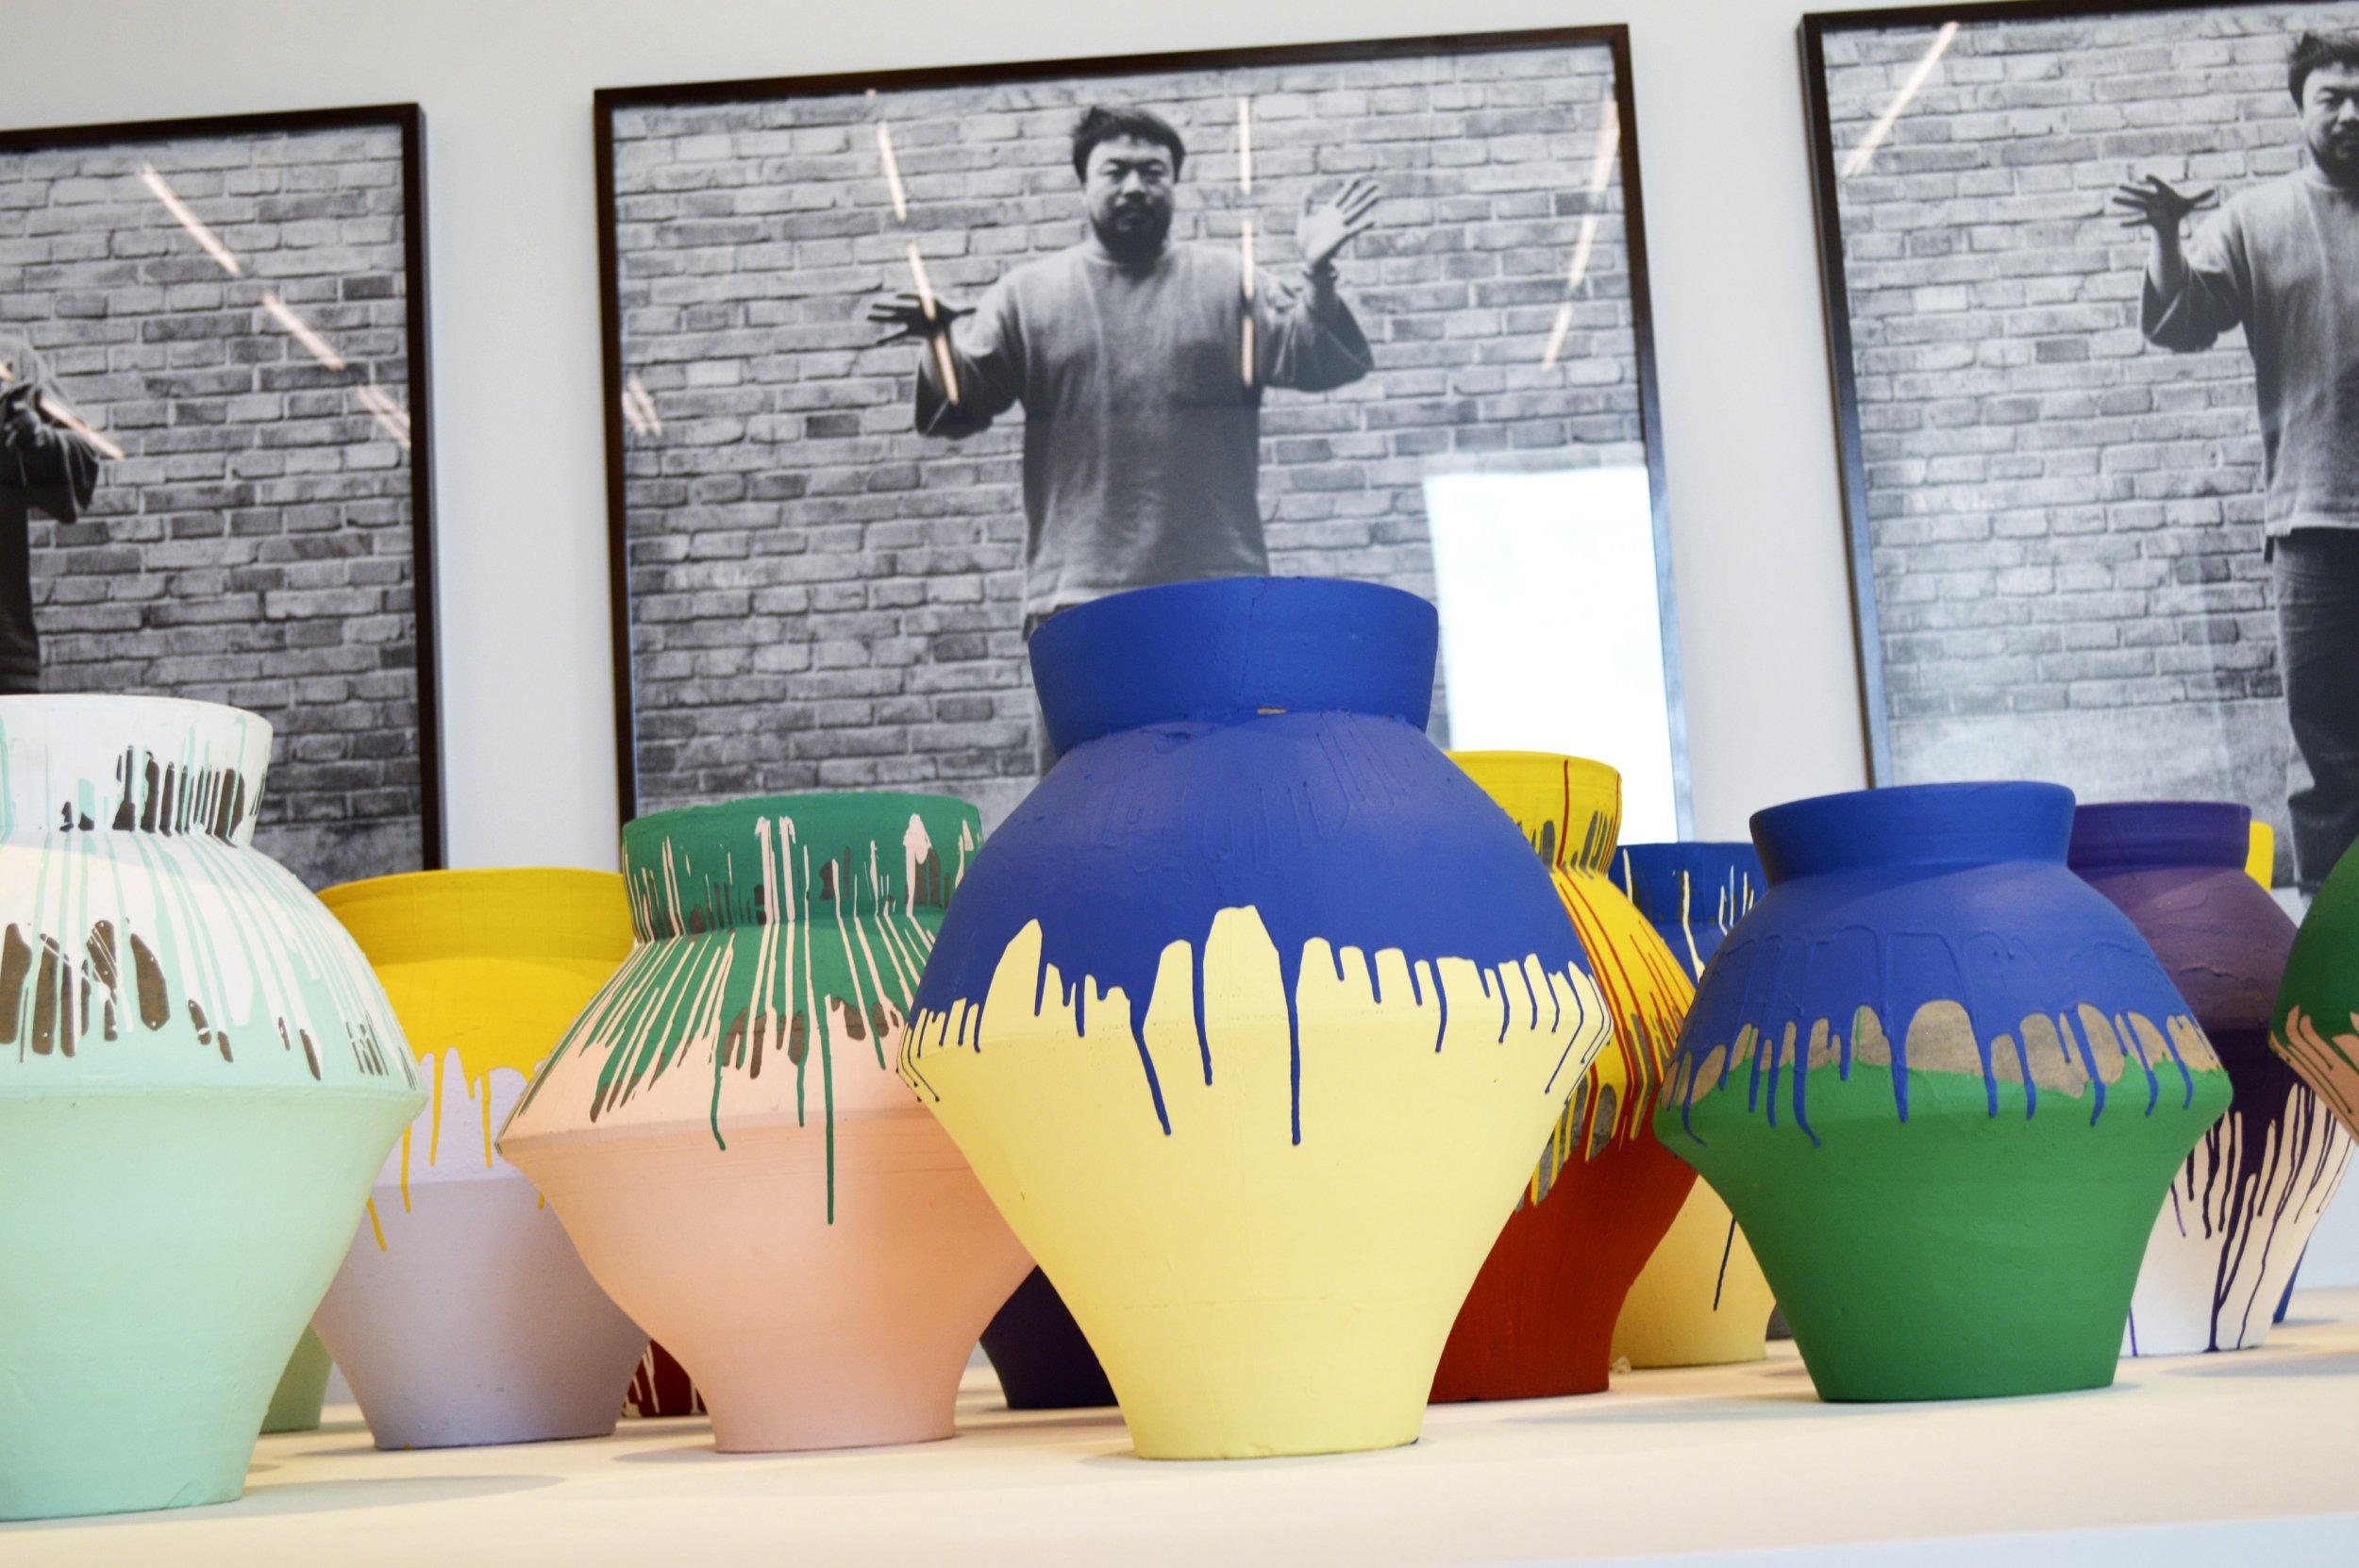 Miami Artist Charged With Smashing 1 Million Ai Weiwei Museum Vase